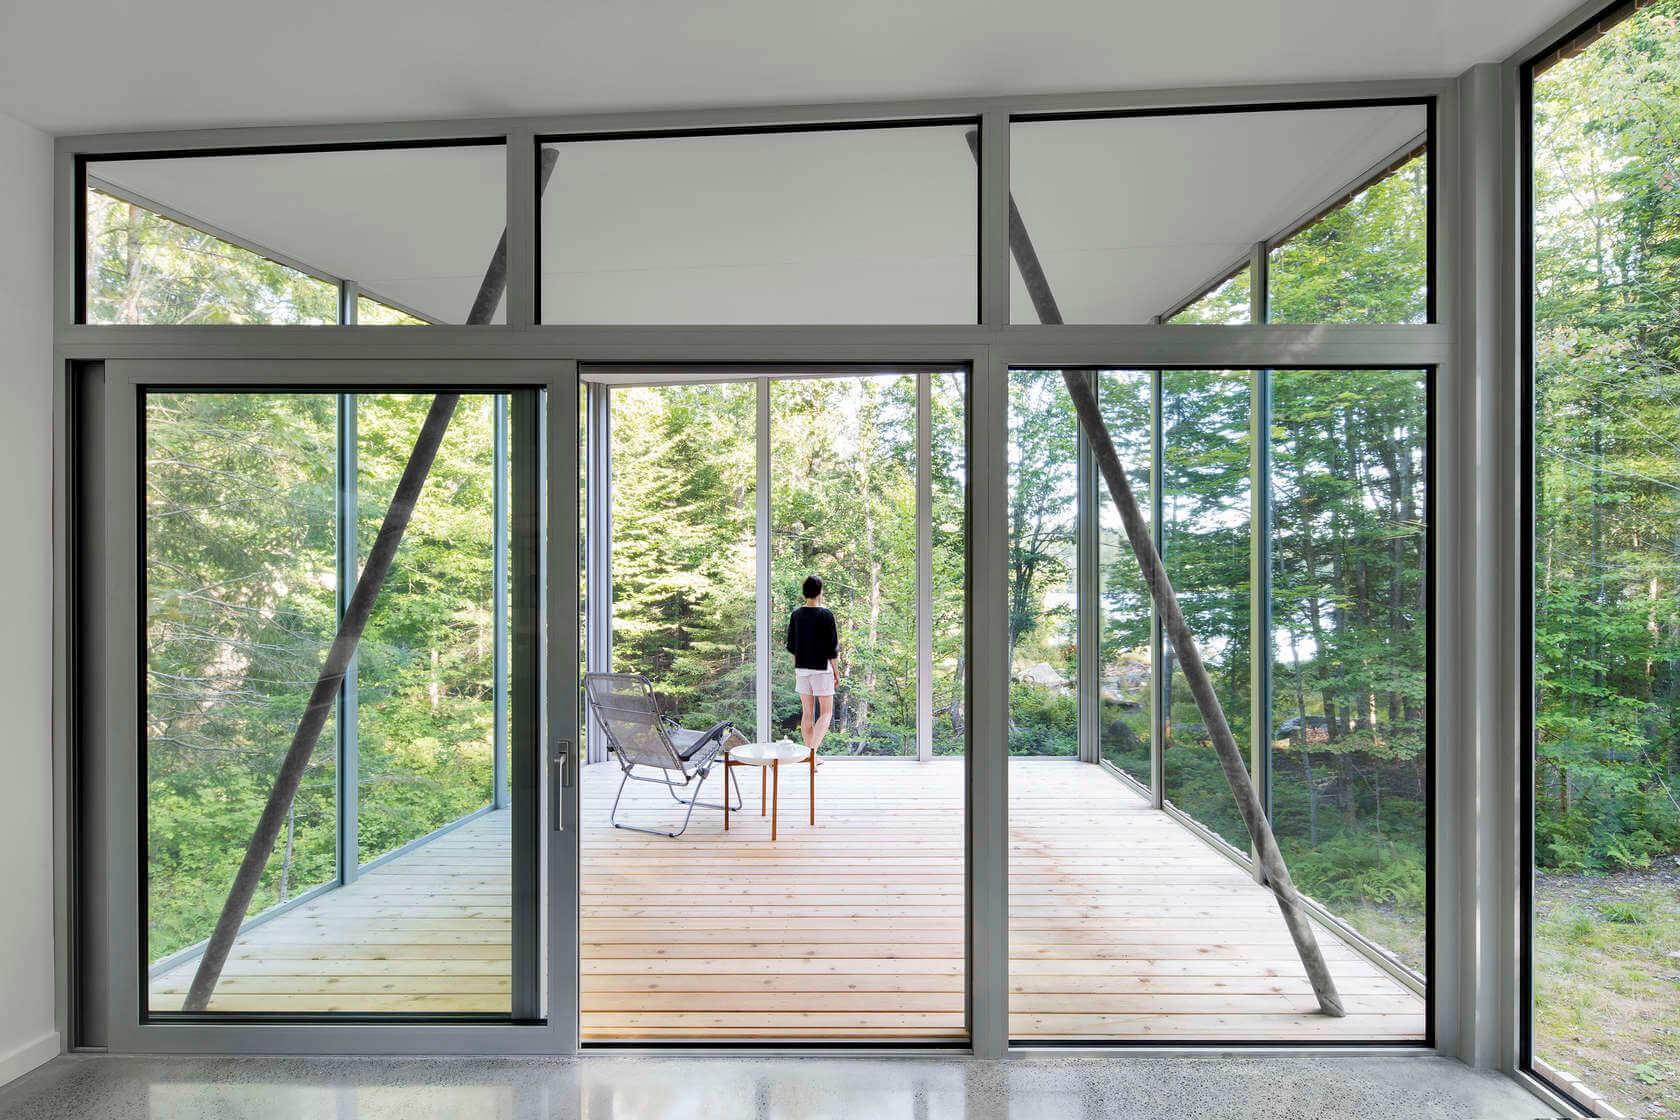 architecture_house_apartment_design_studia_interiors_osnovadesign_osnova_poltava_06